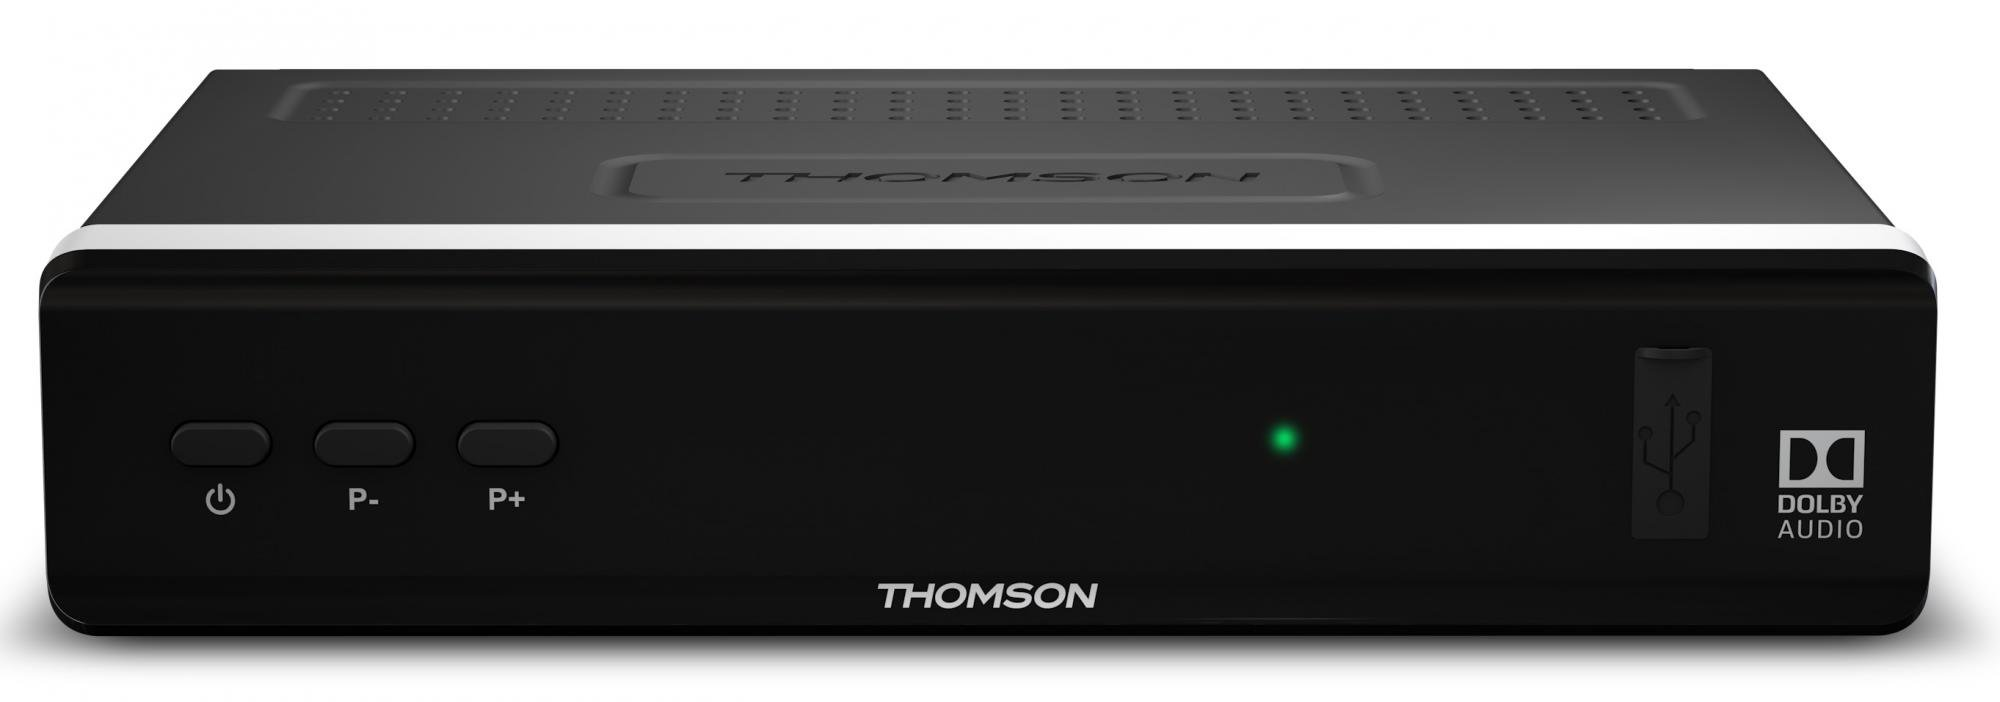 Thomson THS 815 + doprava zdarma